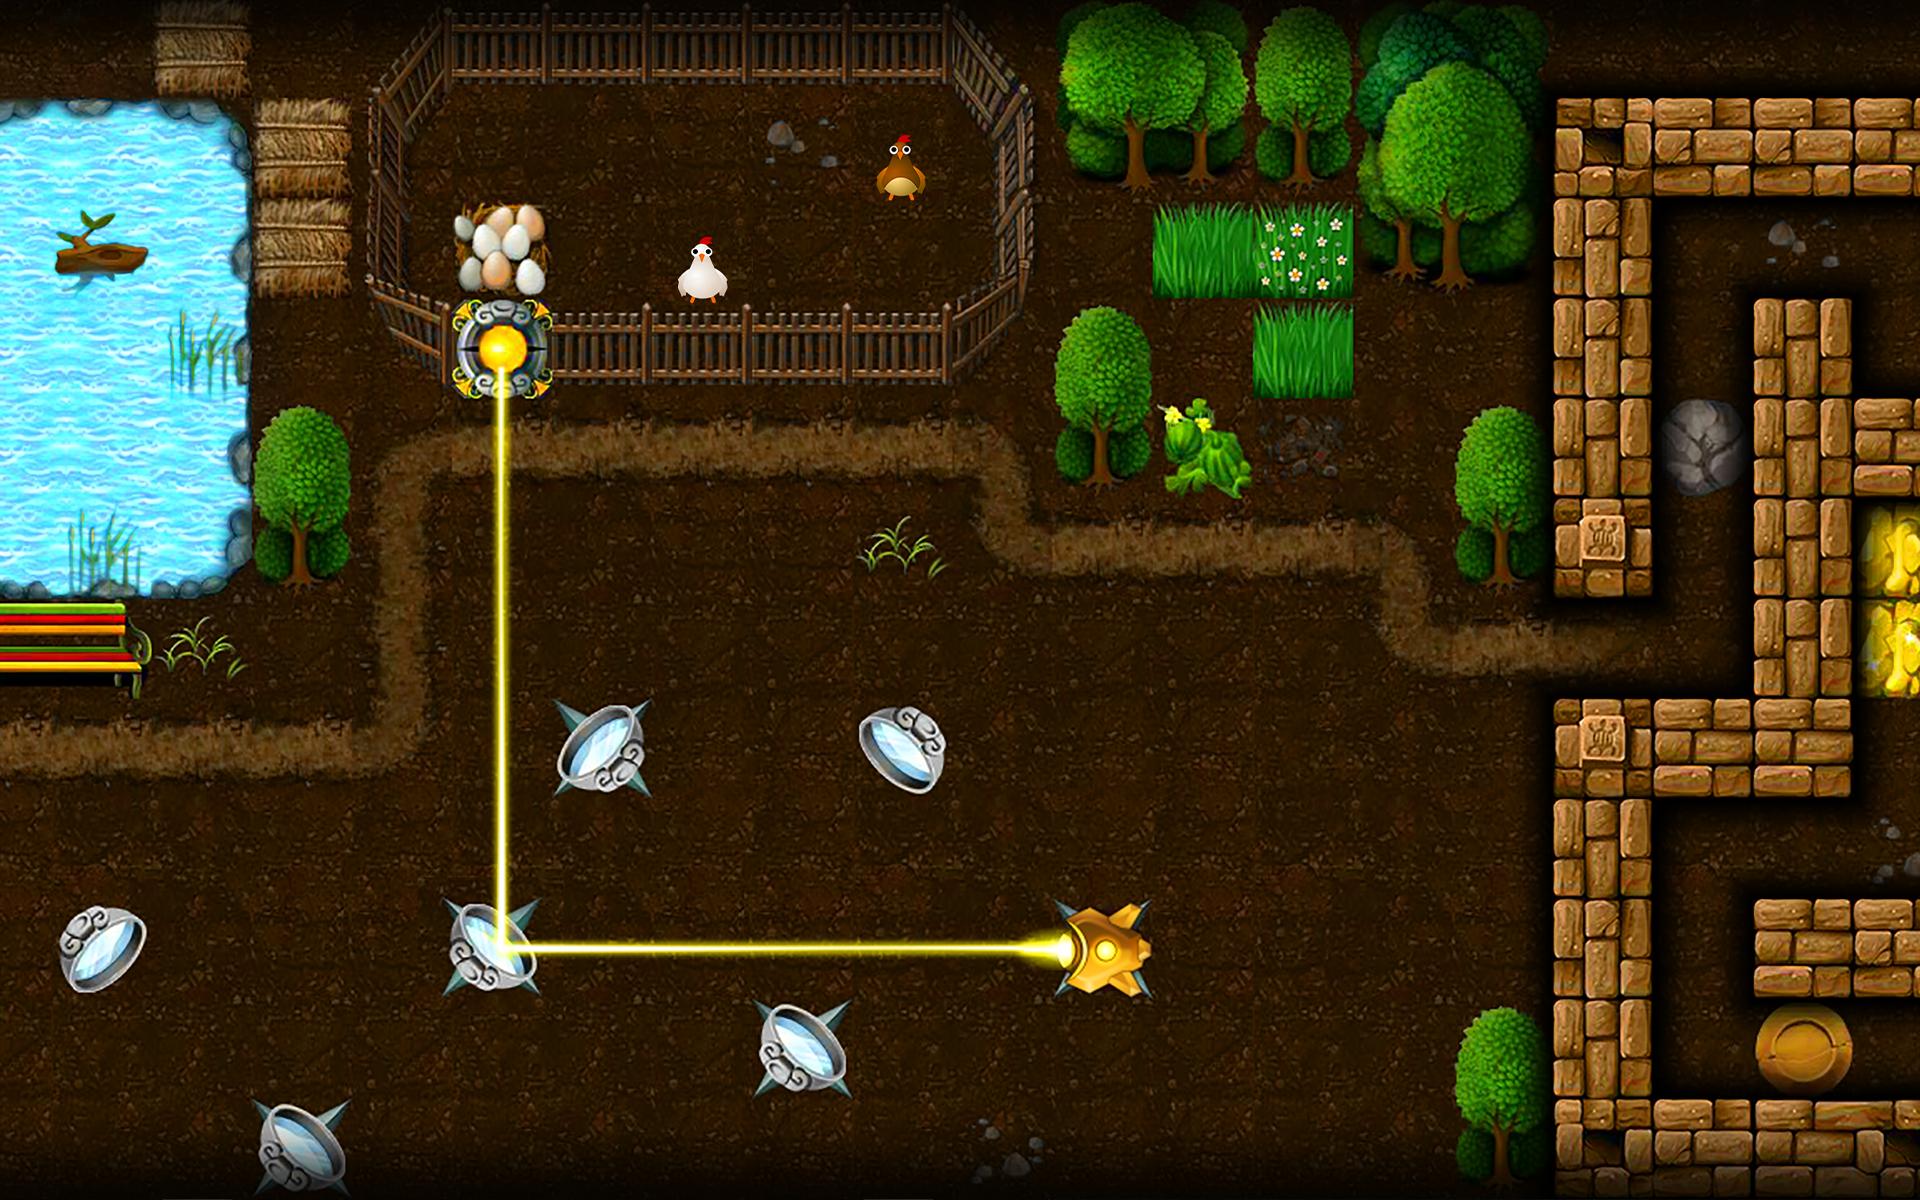 Forge Of Empires Karte Komplettlösung.Diggy S Adventure Amazon De Apps Für Android